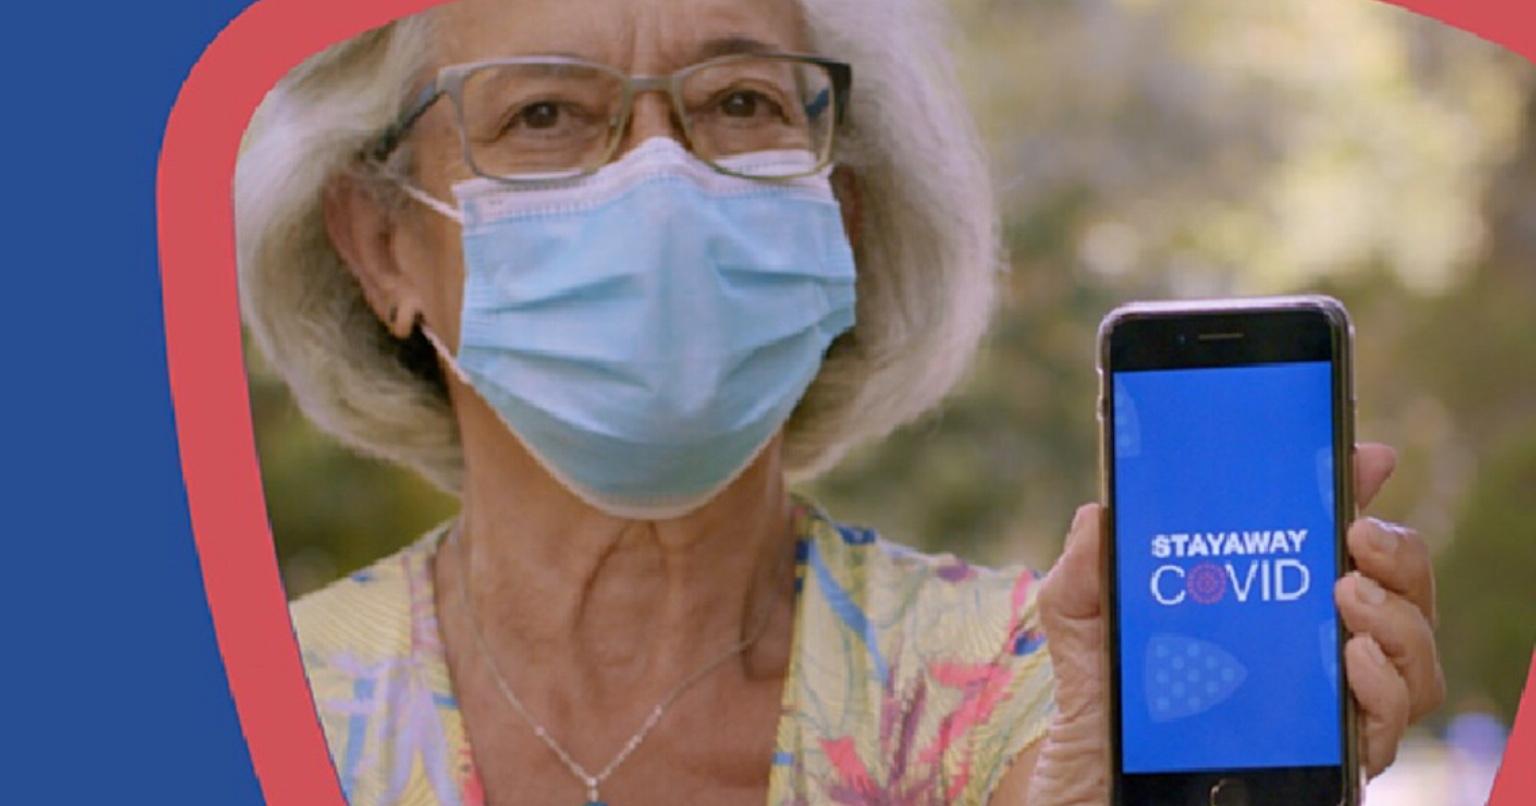 Governo português apresenta a app Stayaway Covid